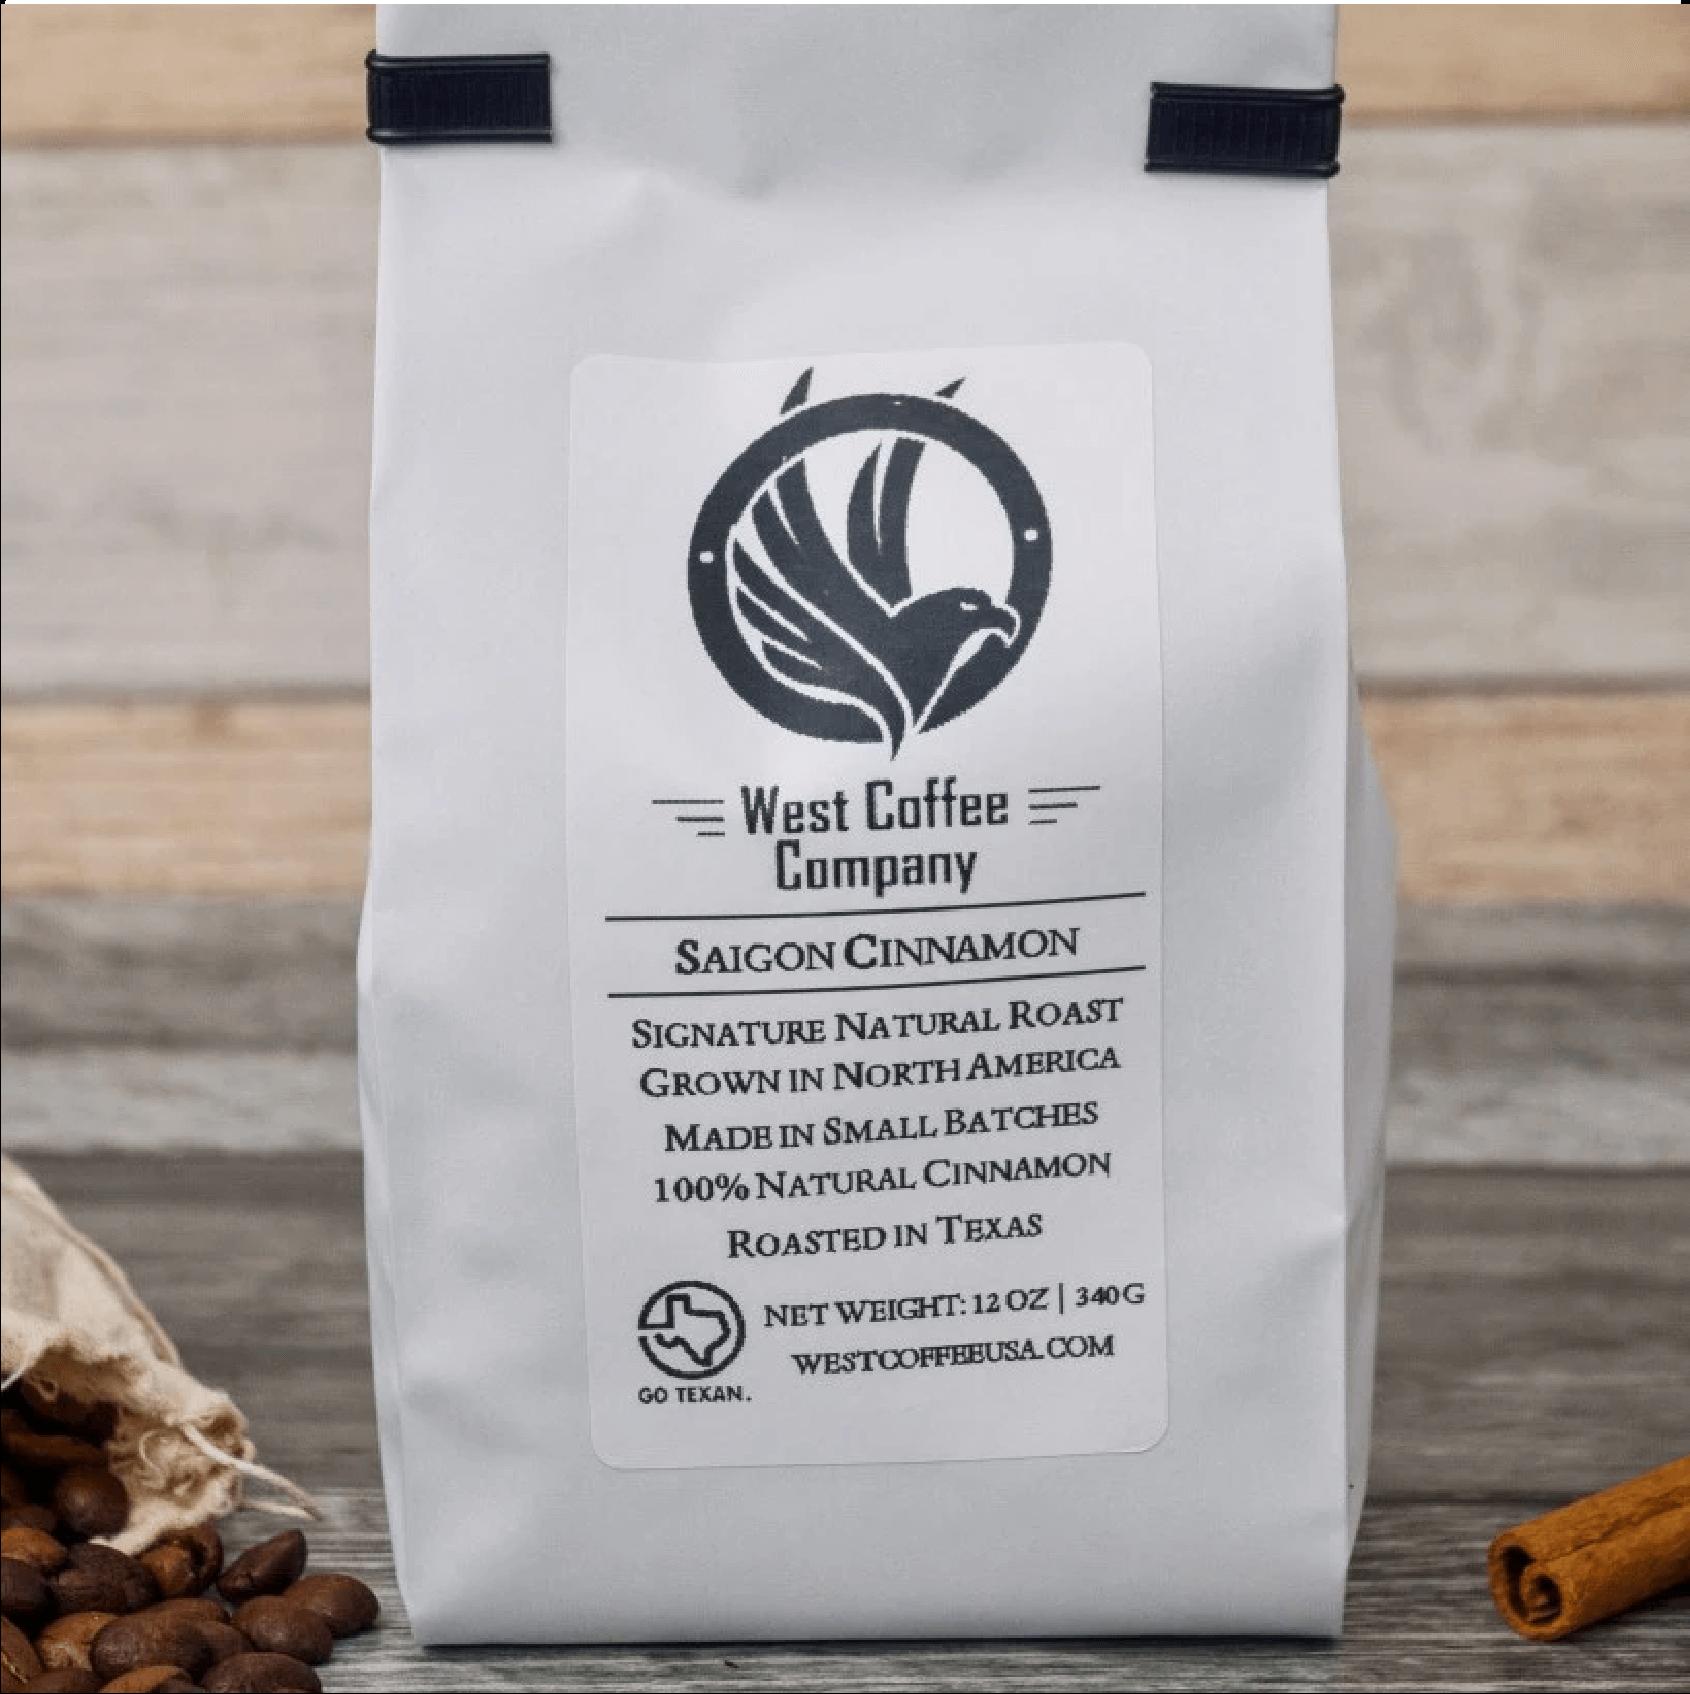 Origin Pack - Saigon Cinnamon (12 oz) from West Coffee Company